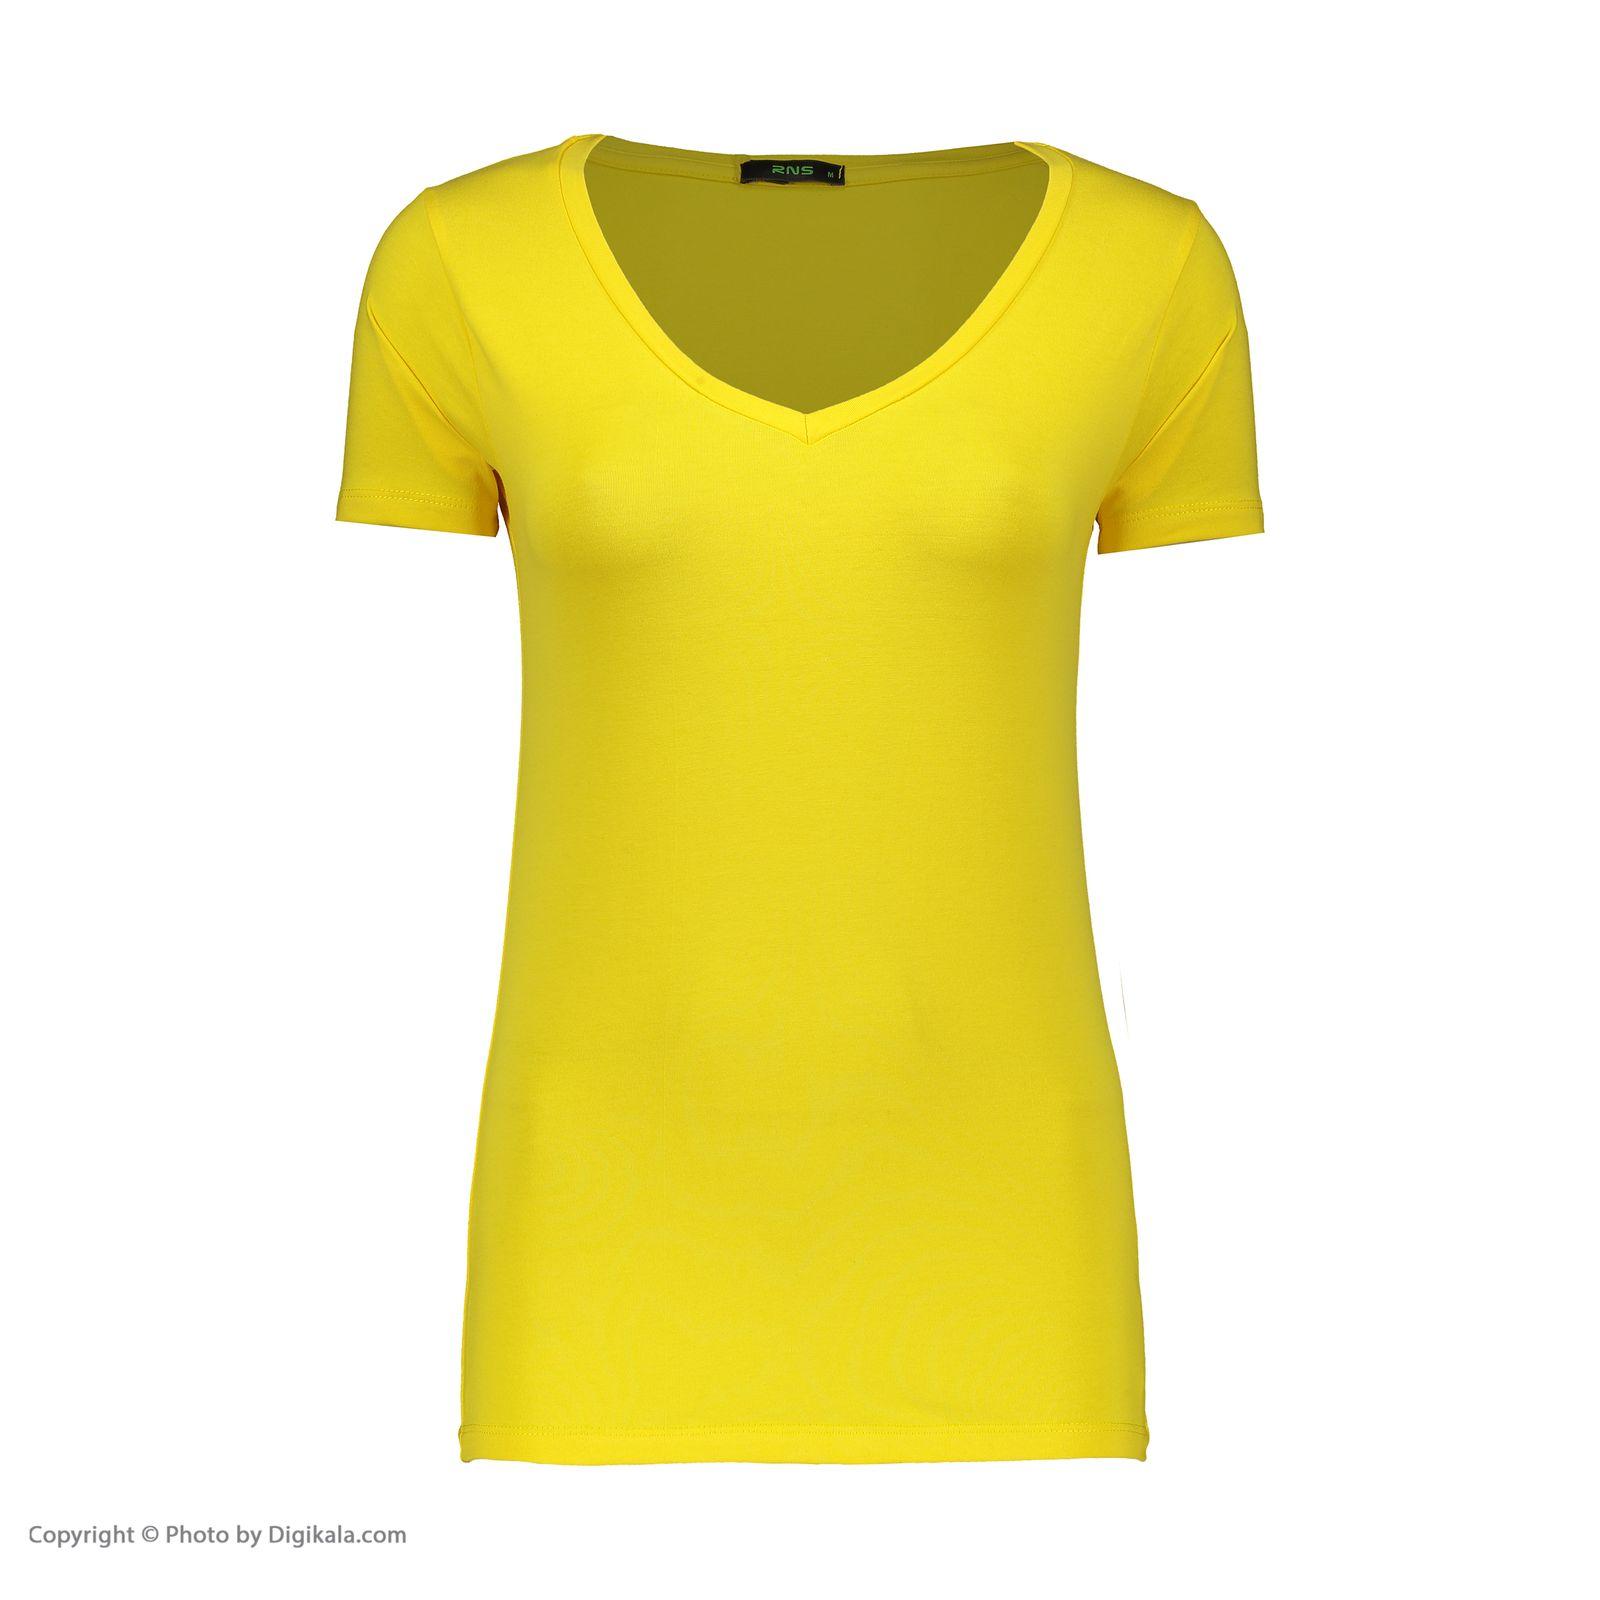 تصویر تی شرت زنانه آر ان اس مدل 1102077-16